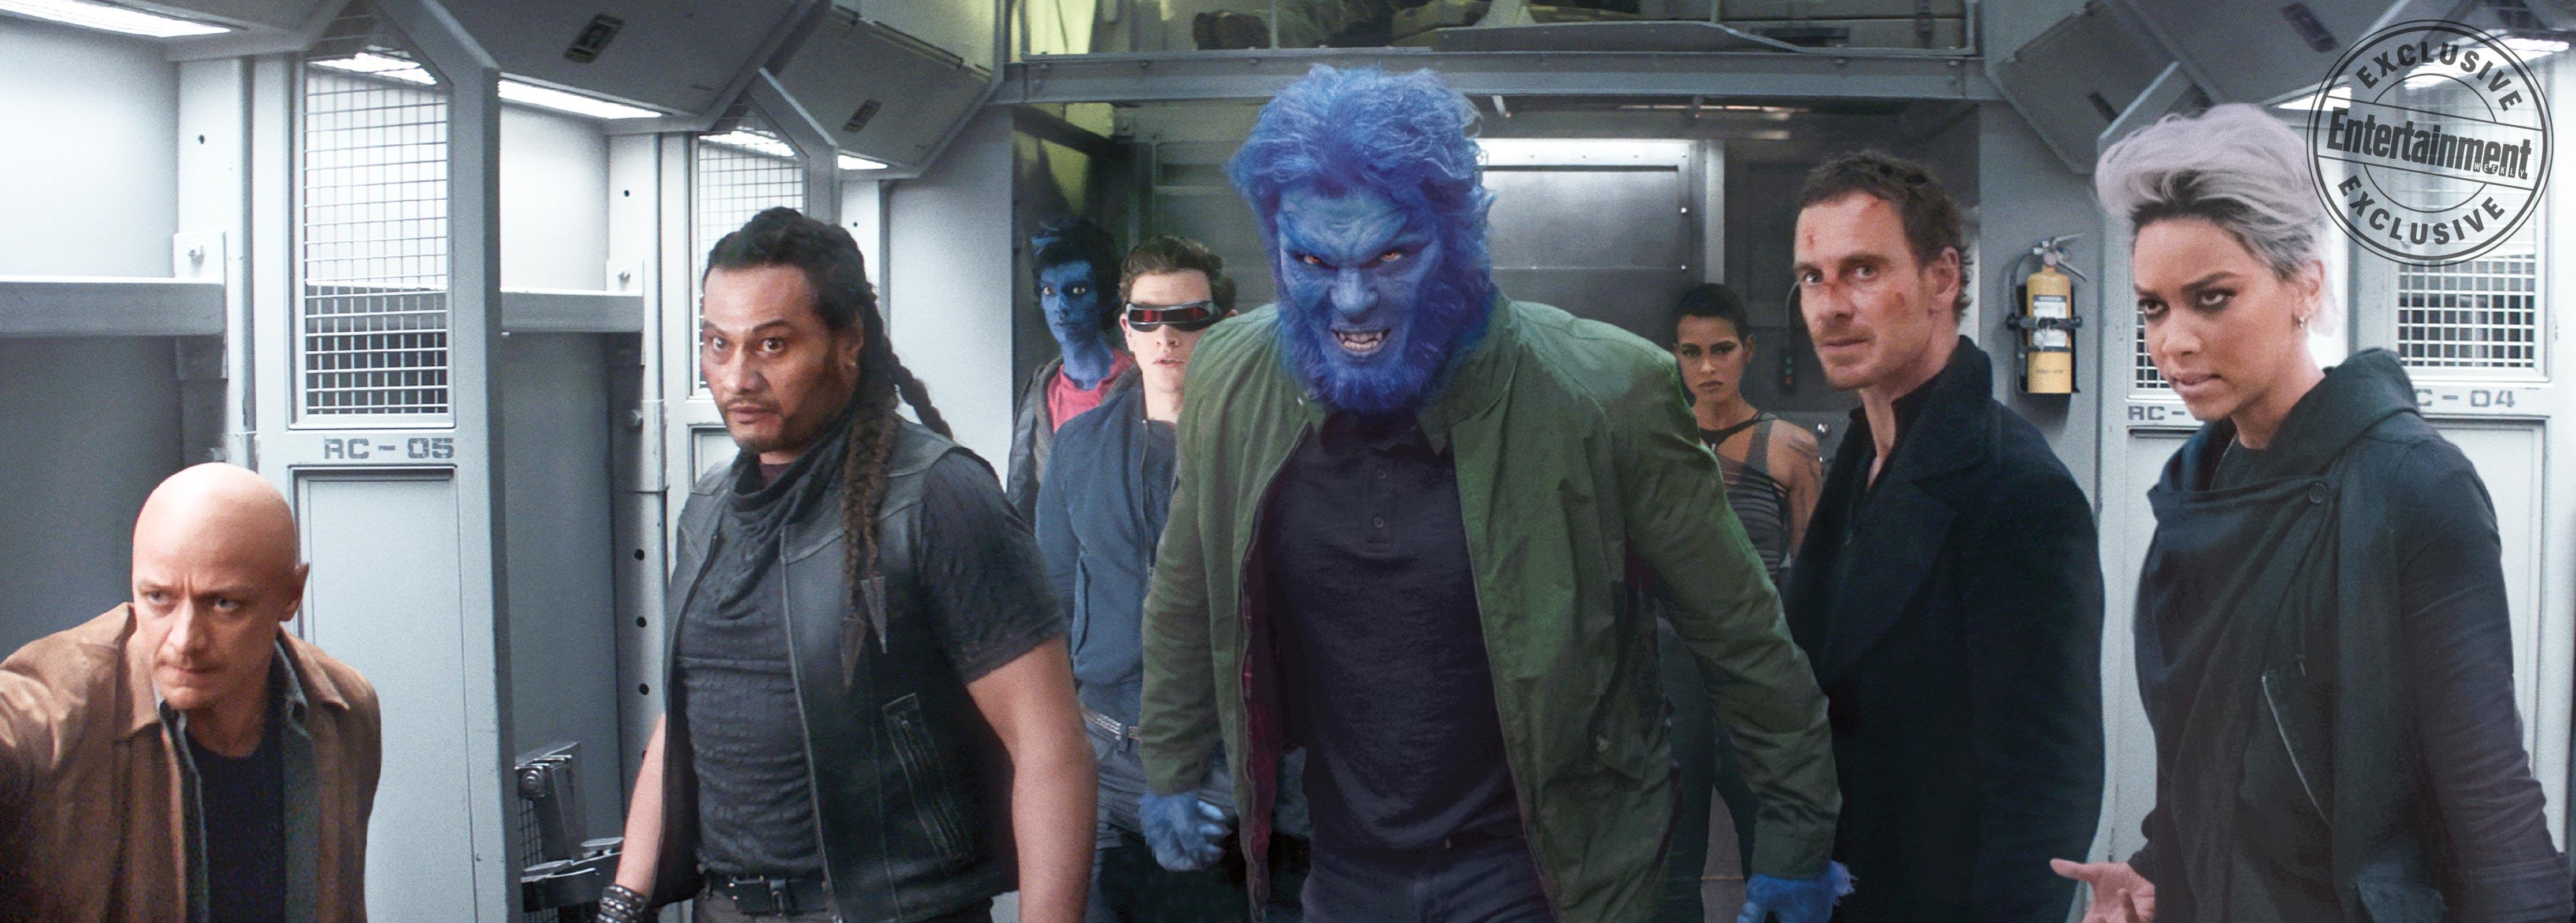 New Dark Phoenix still featuring Professor X, Magneto, Beast and other mutants